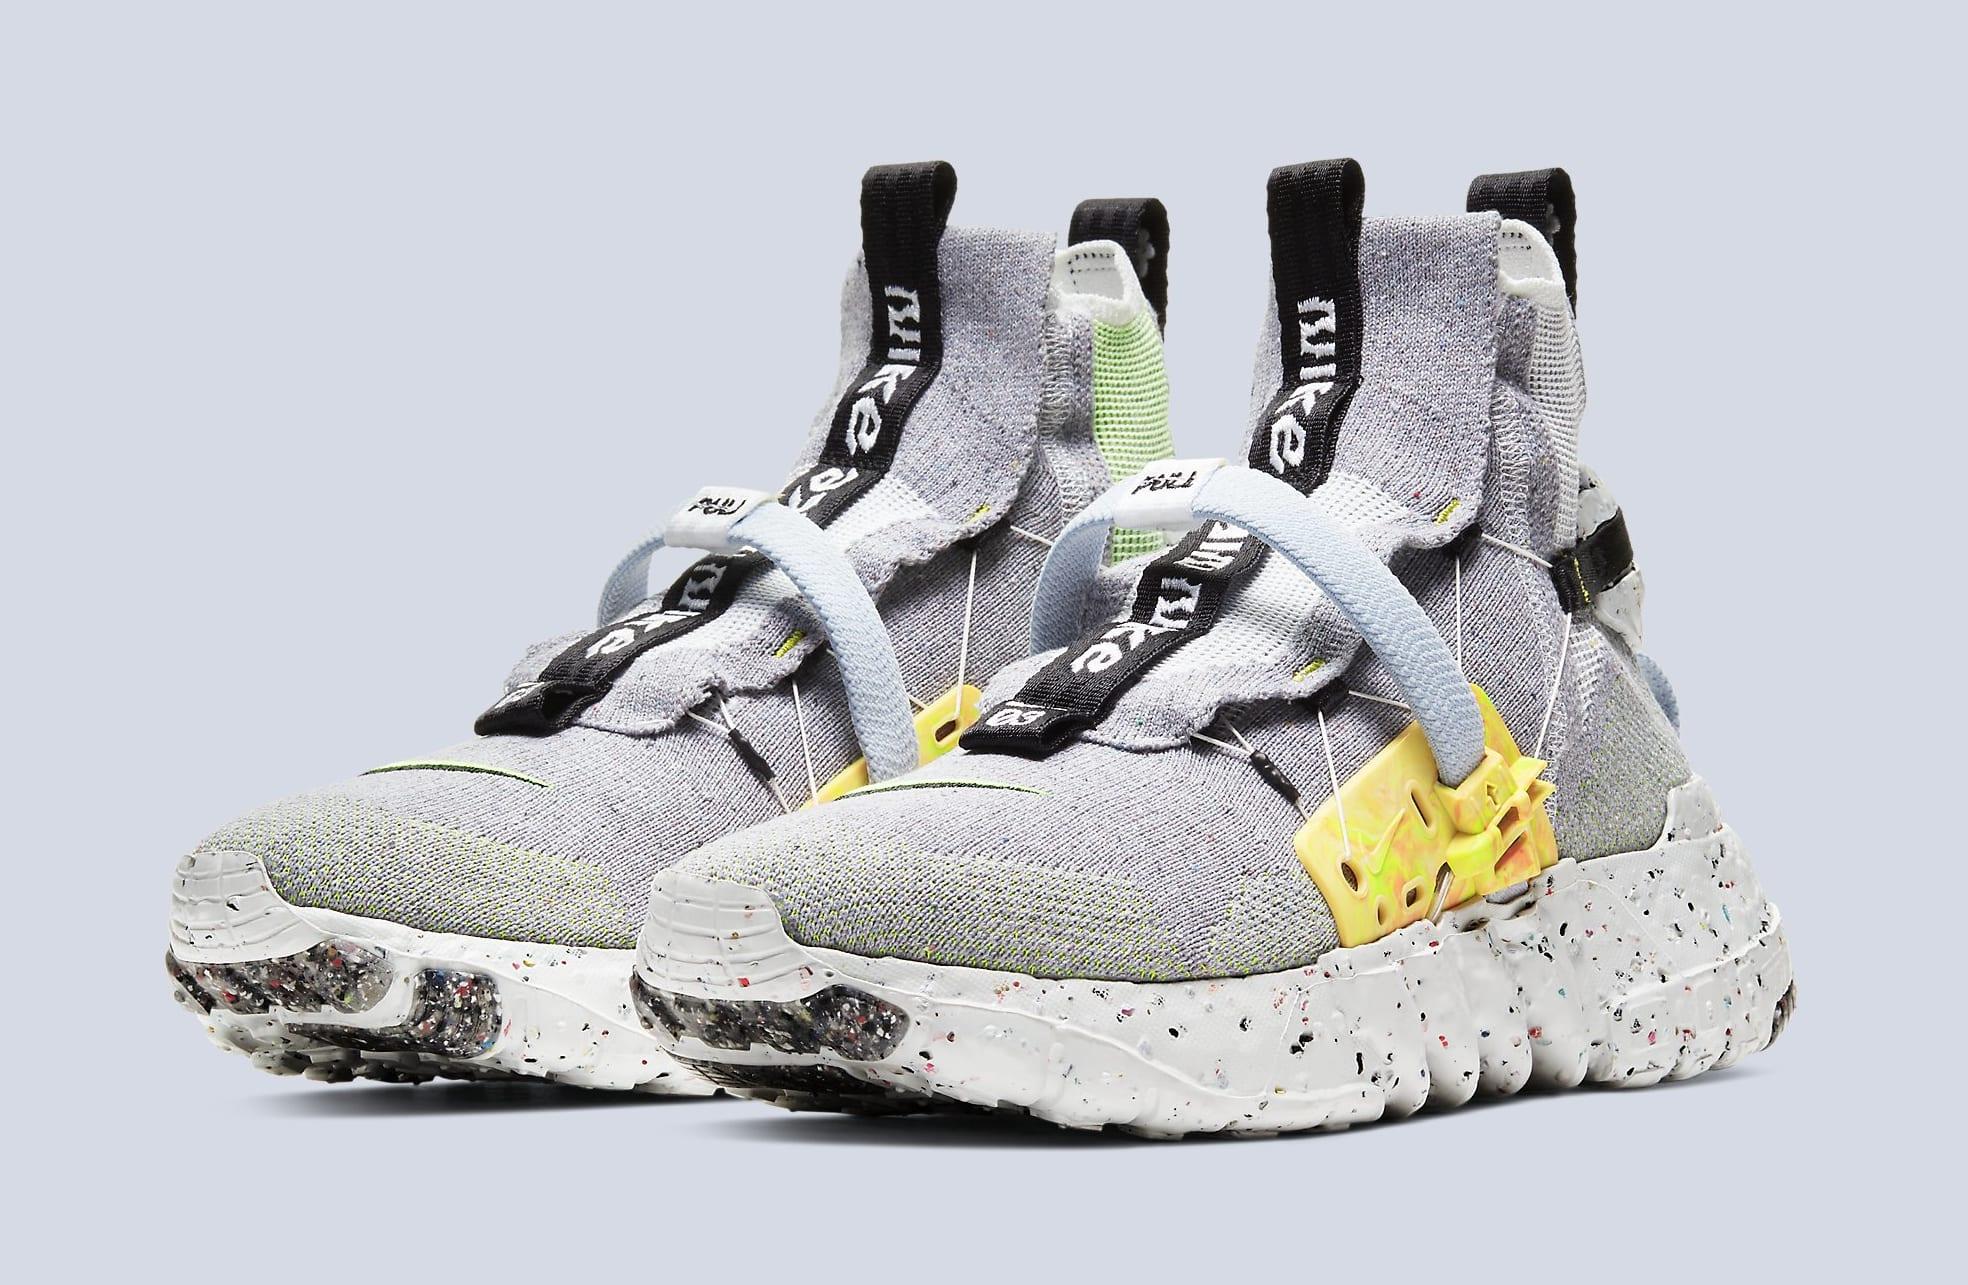 Nike Space Hippie 03 'Grey/Volt' CQ3989-002 Pair